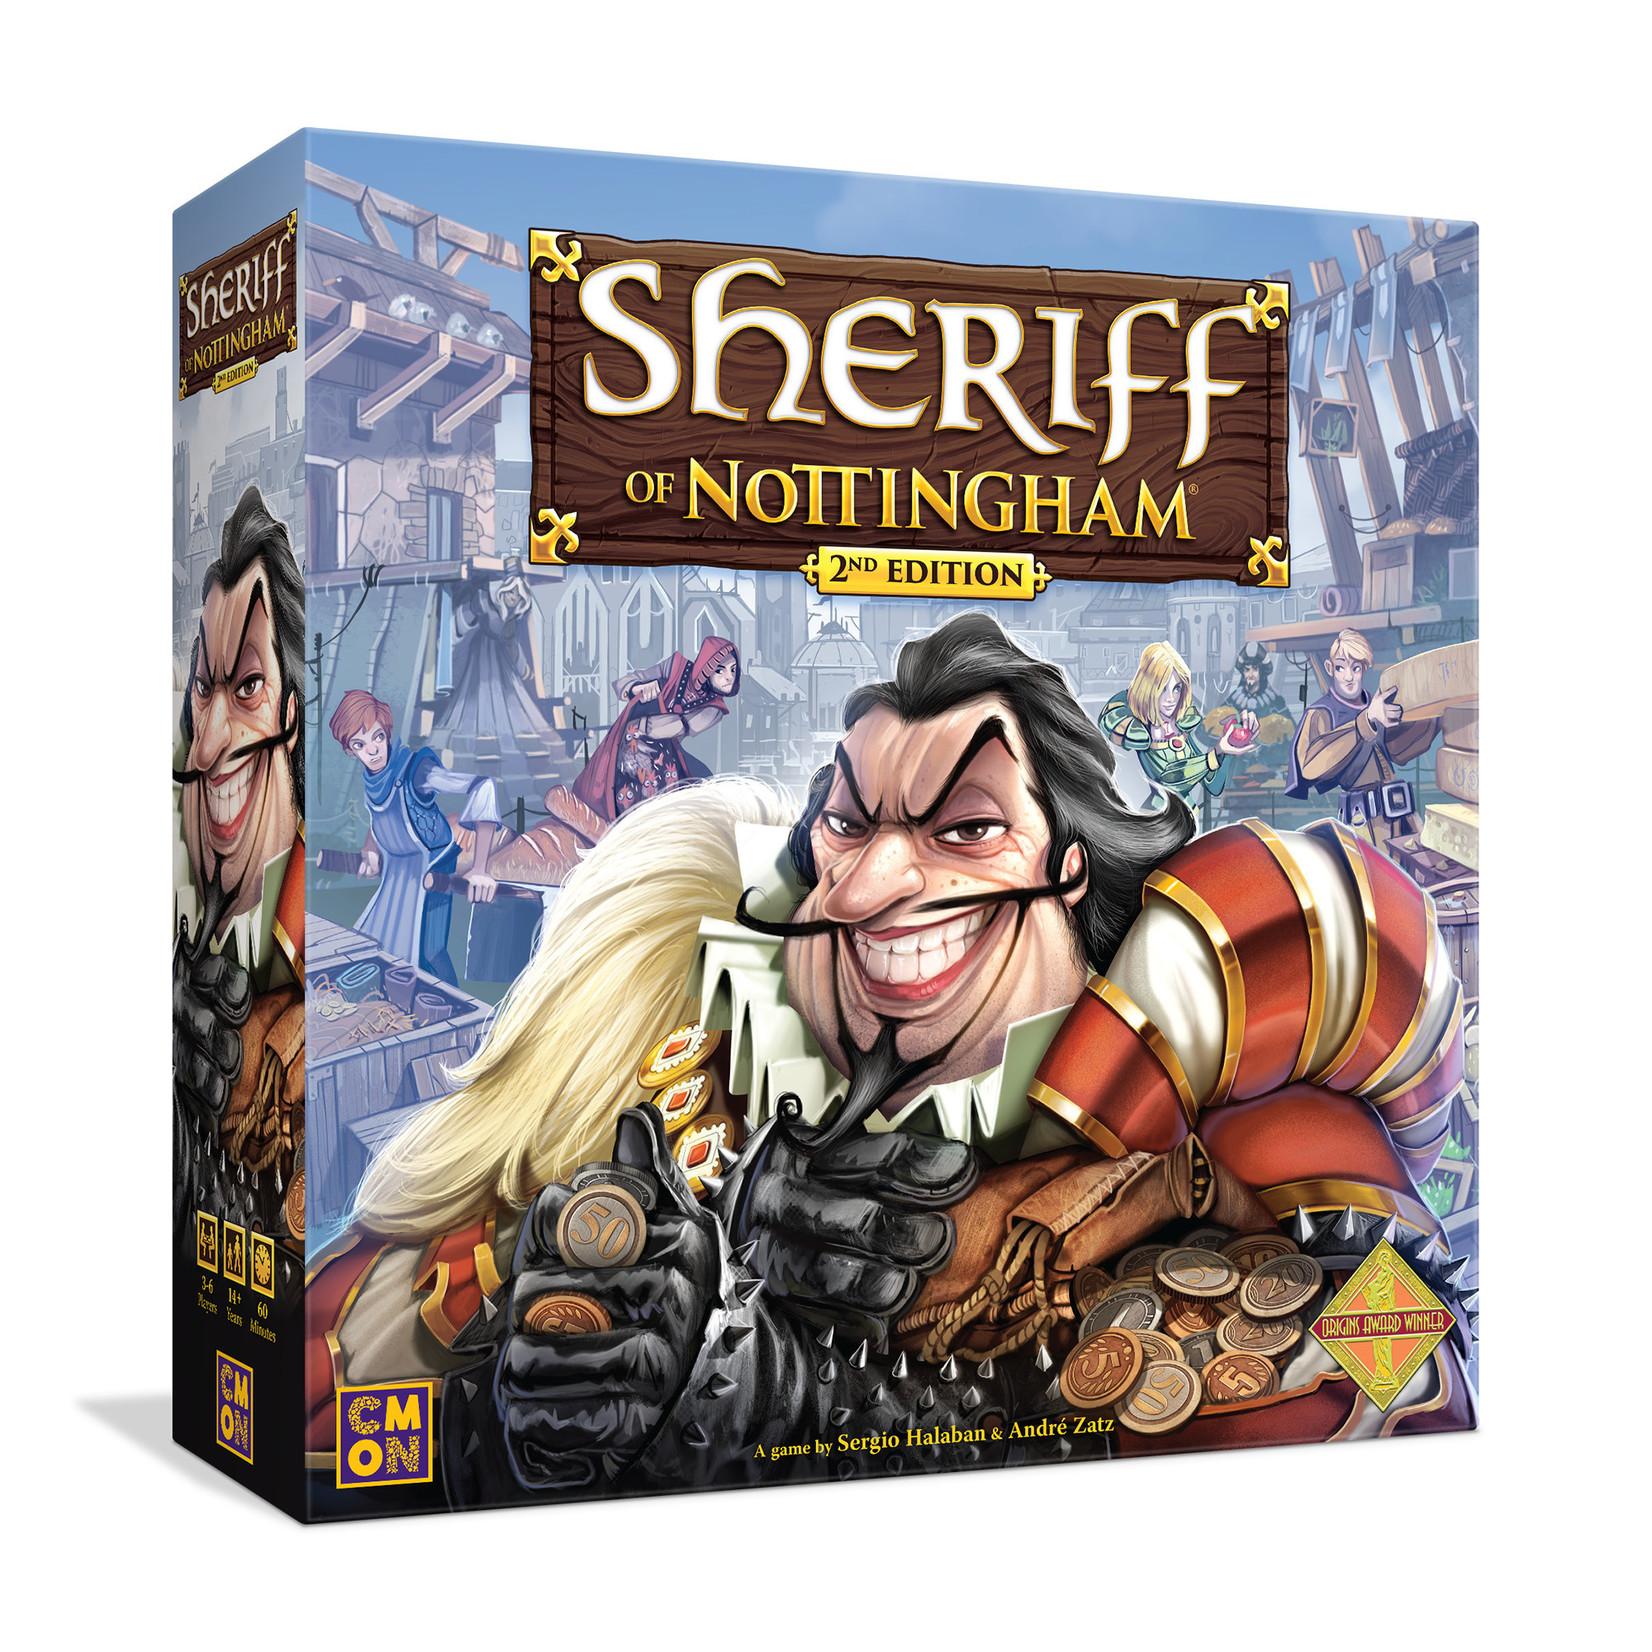 Sheriff of Nottingham 2nd Edition